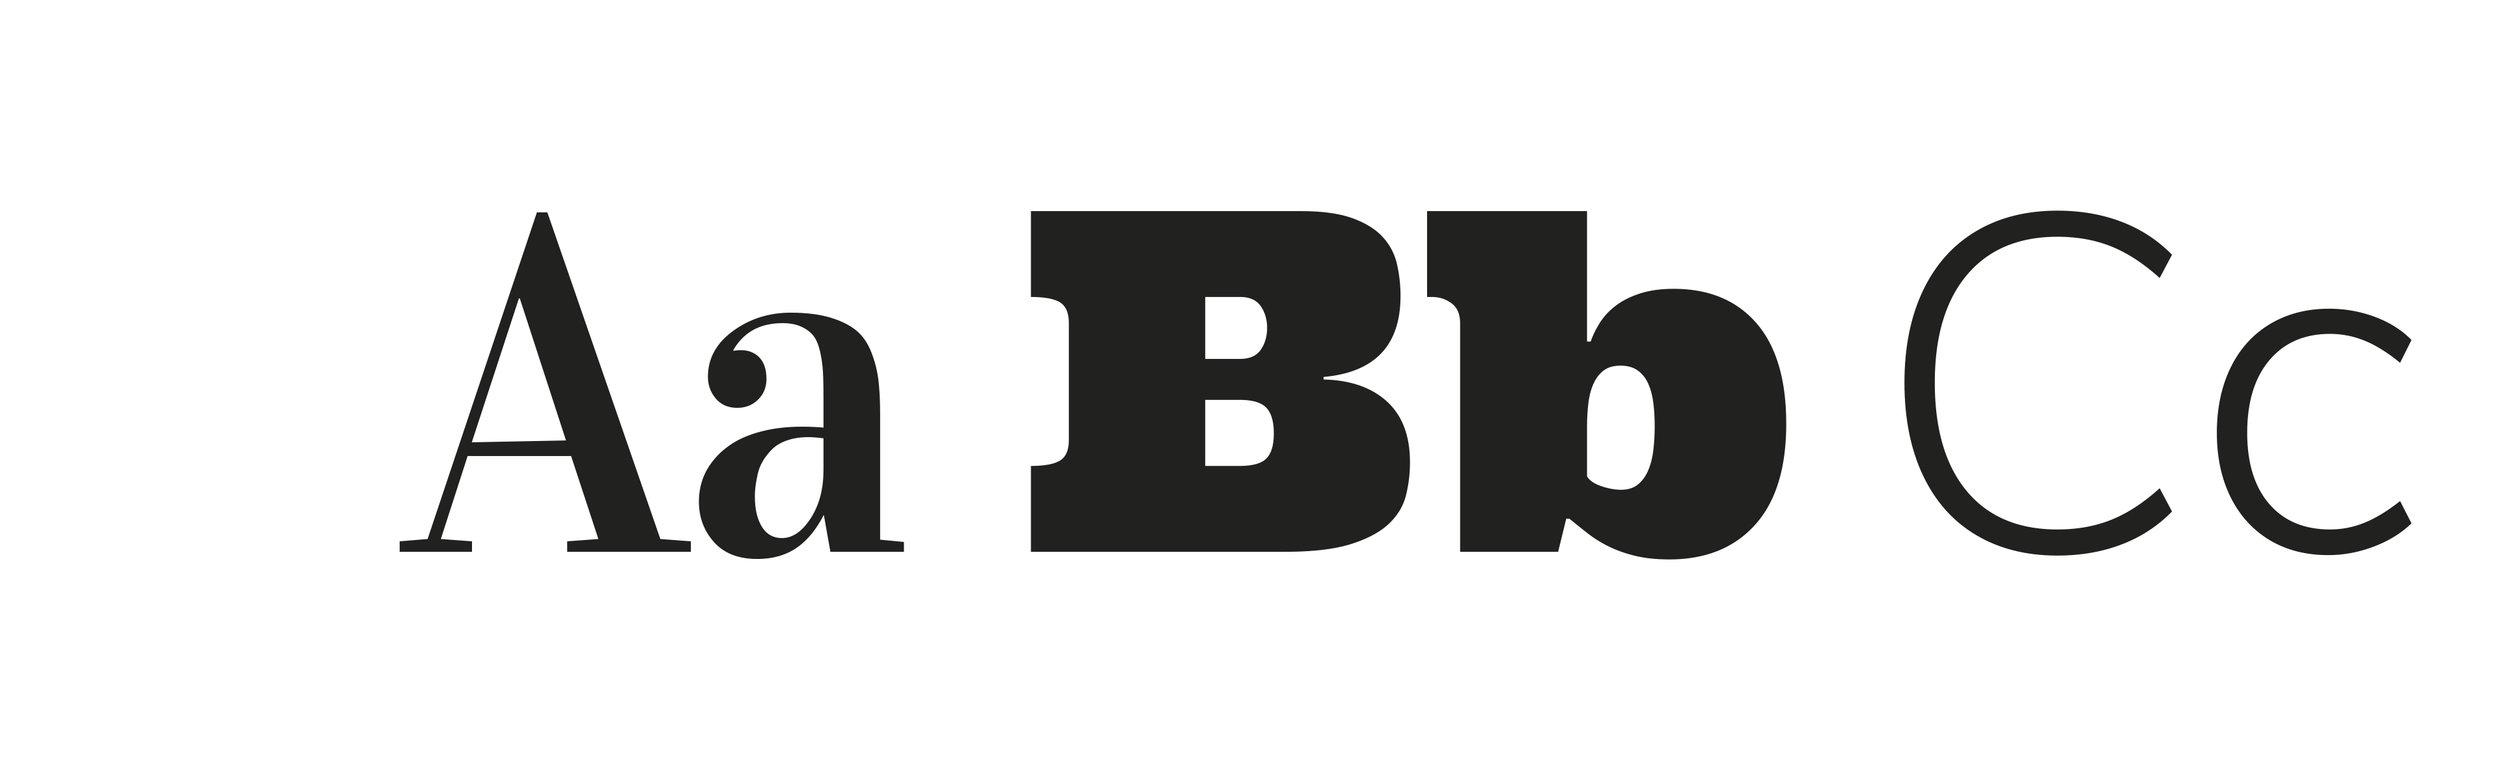 Private-Room-typefaces.jpg